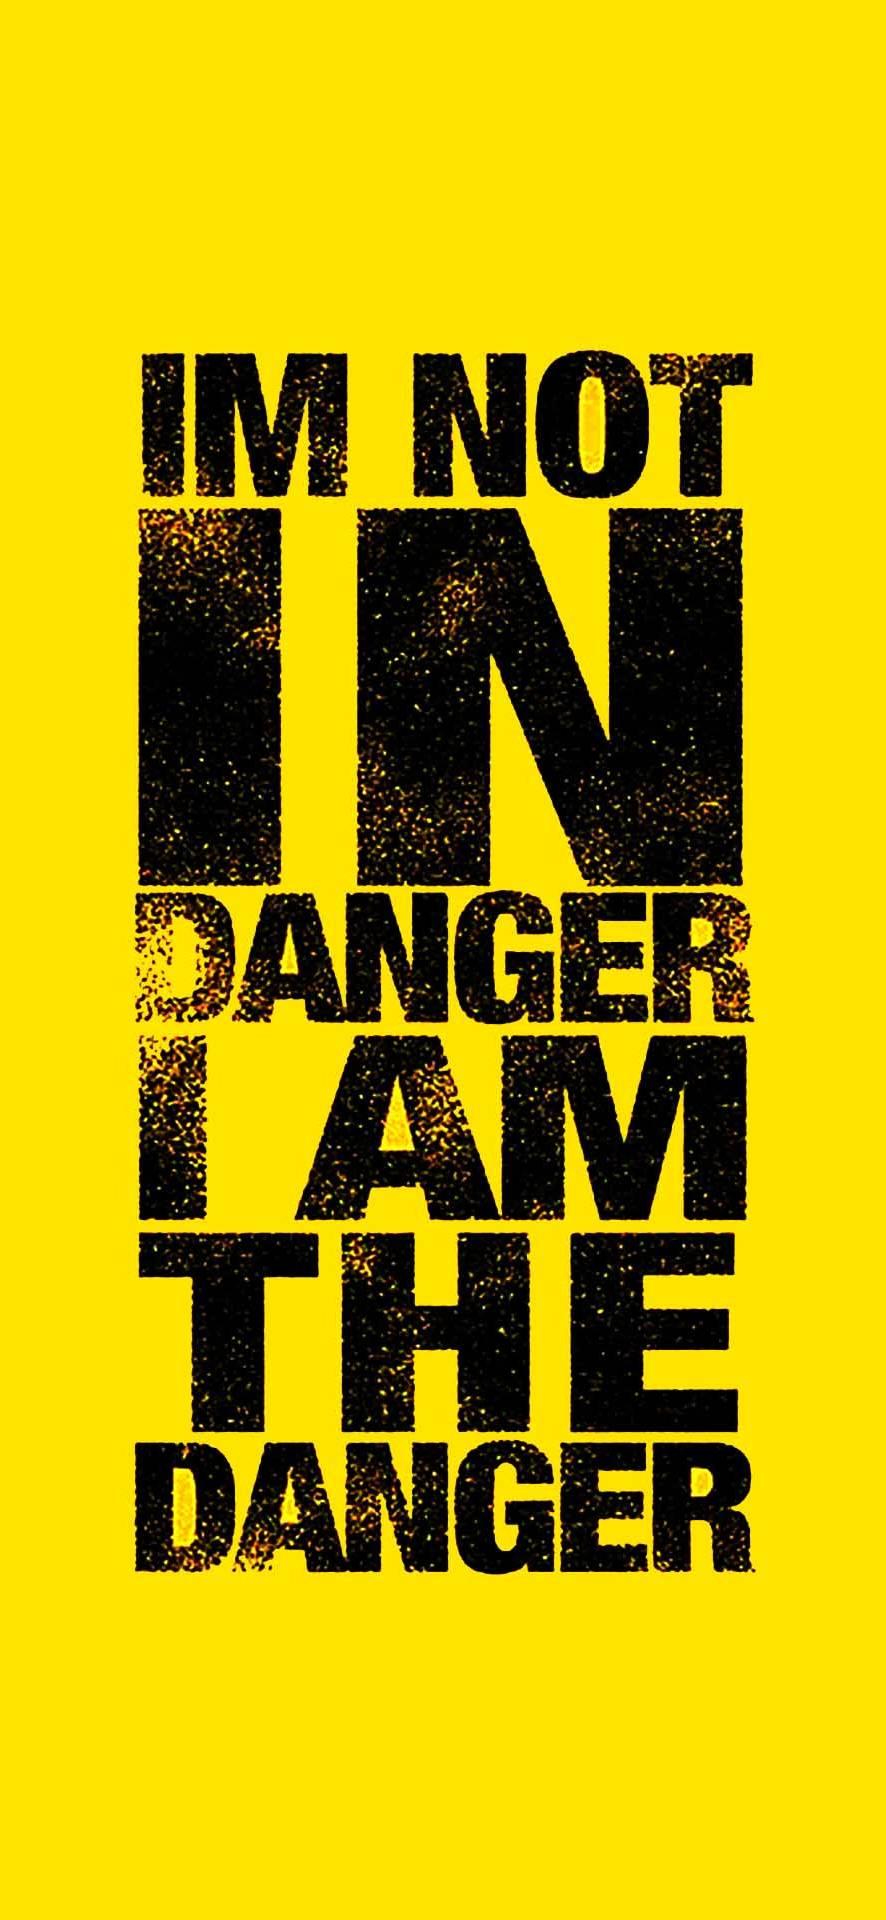 Im Not In Danger Wallpaper Breaking Bad Wallpapers For Android 886x1920 Download Hd Wallpaper Wallpapertip